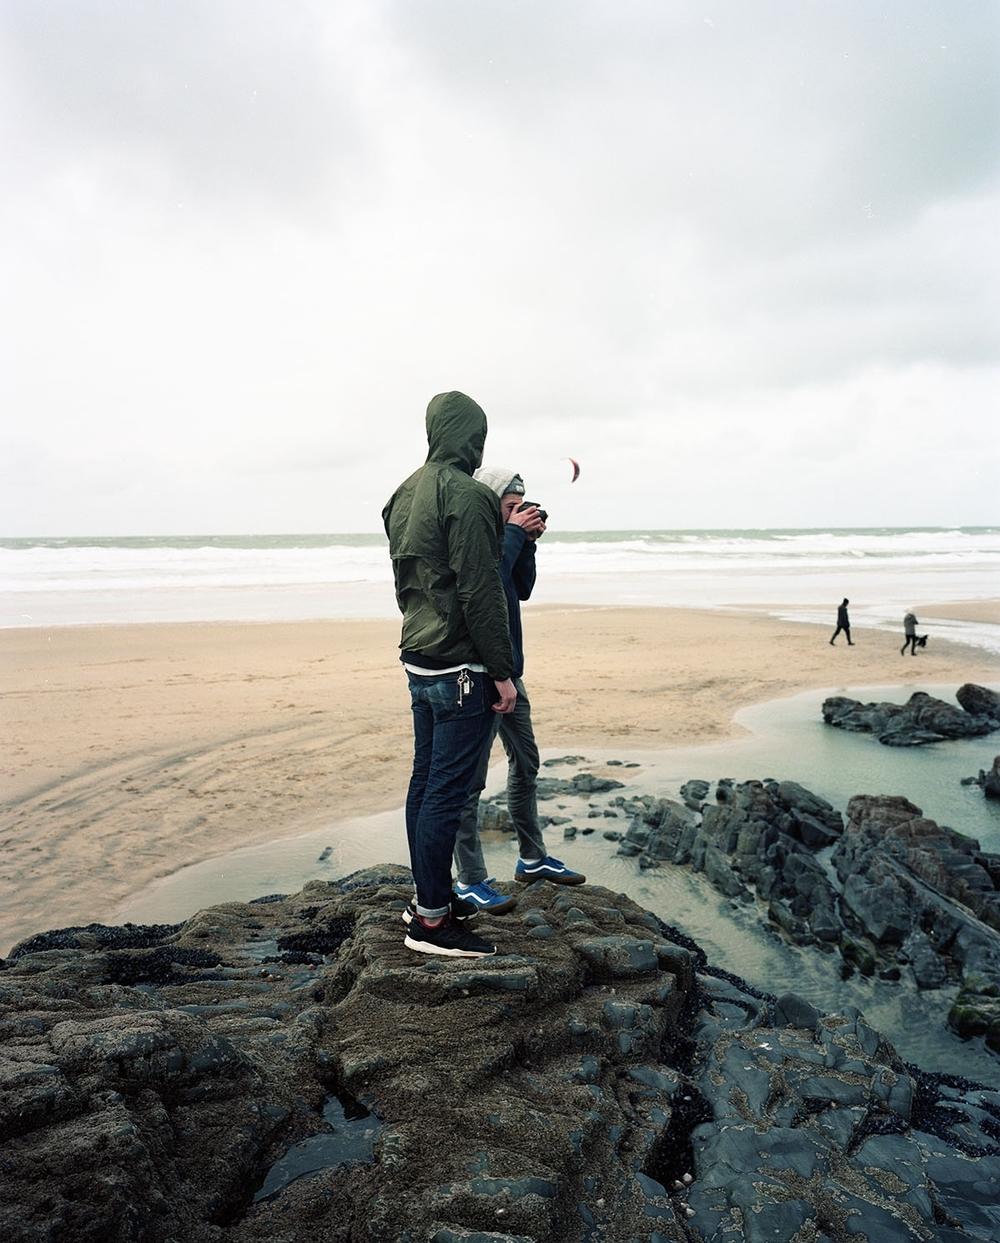 Beach 5   Gwithian   Kyle Grainger